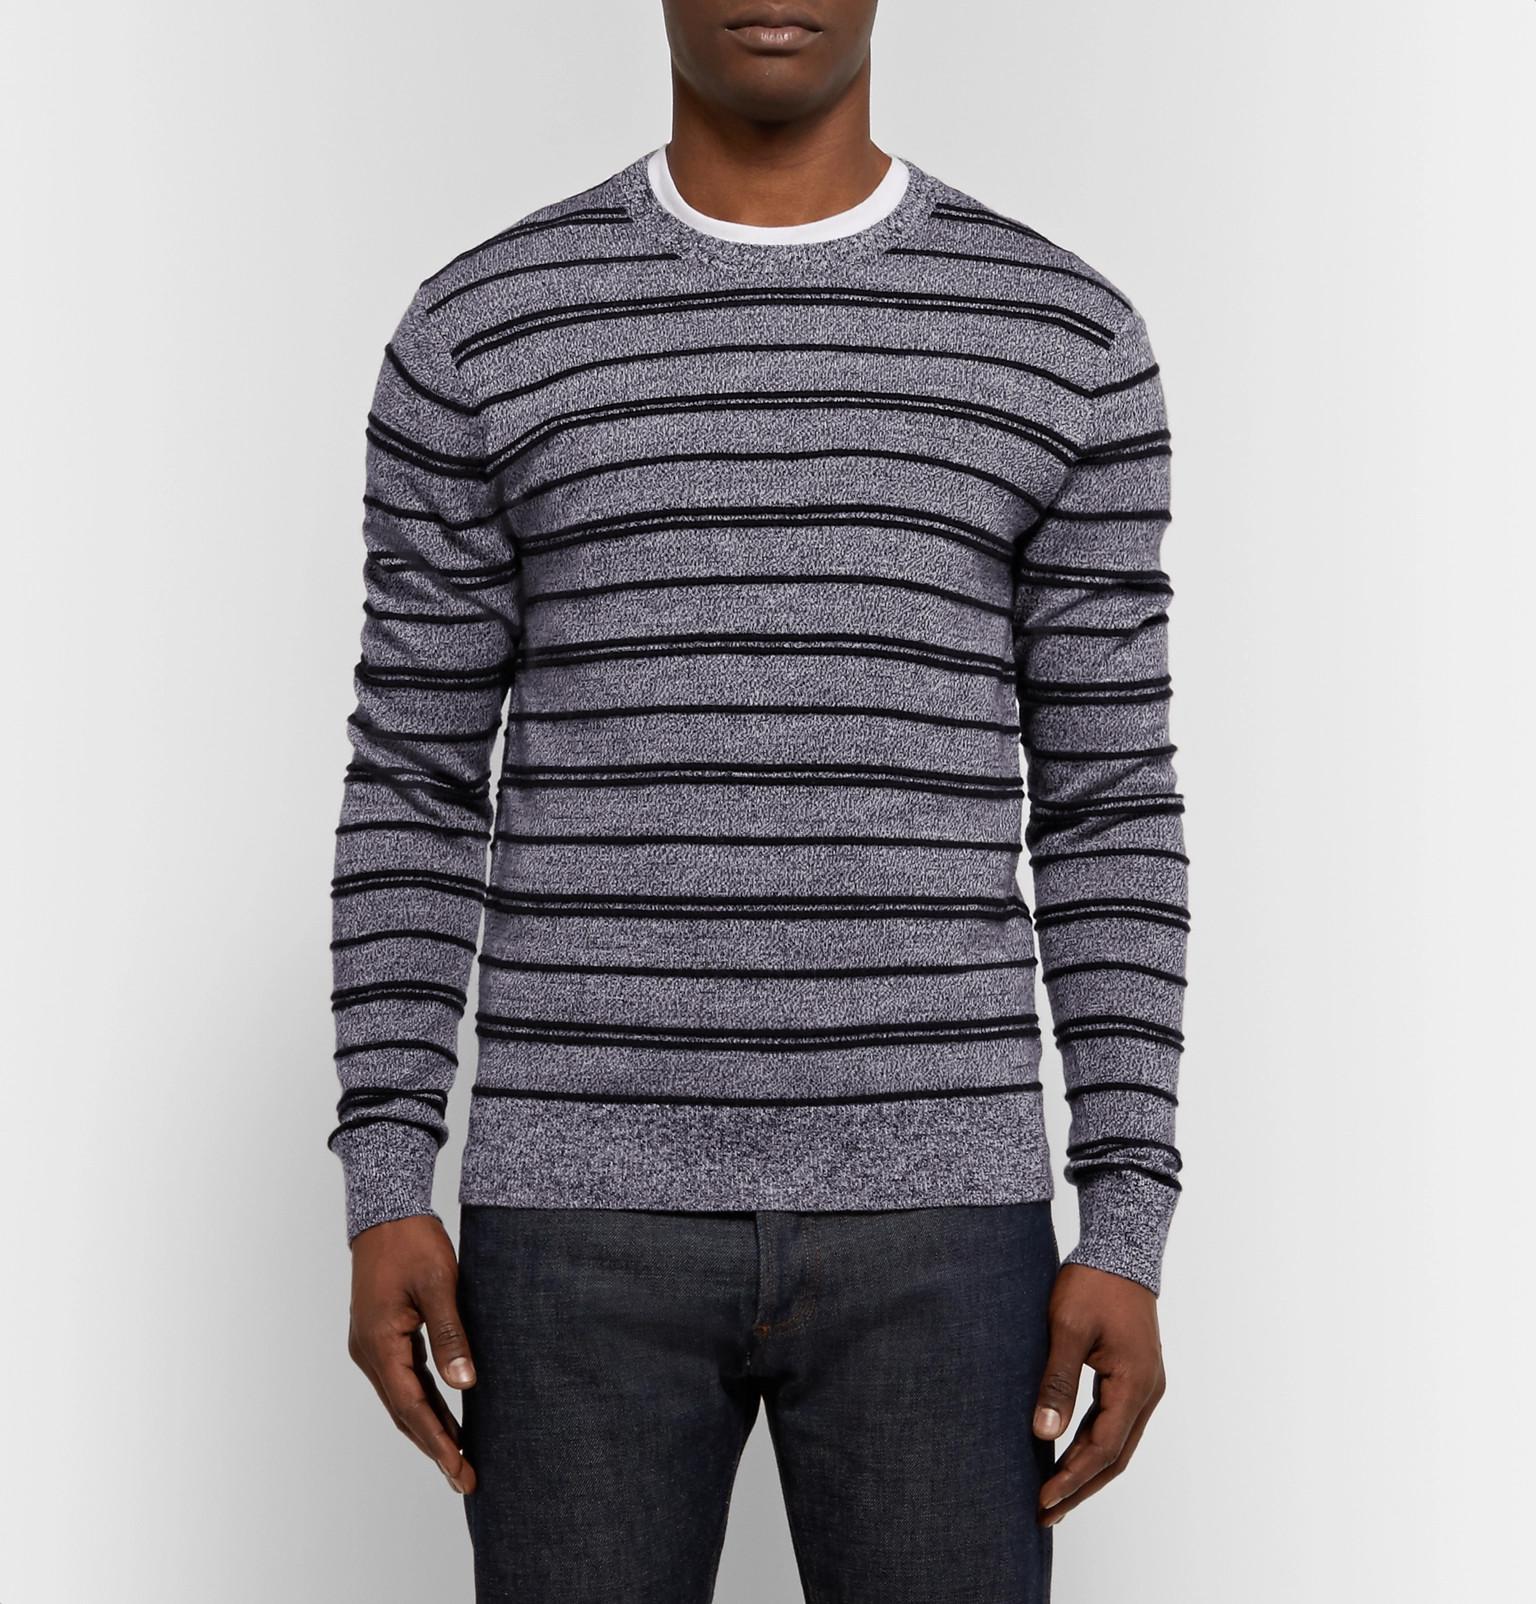 Club Monaco Striped Merino Wool Sweater in Black for Men